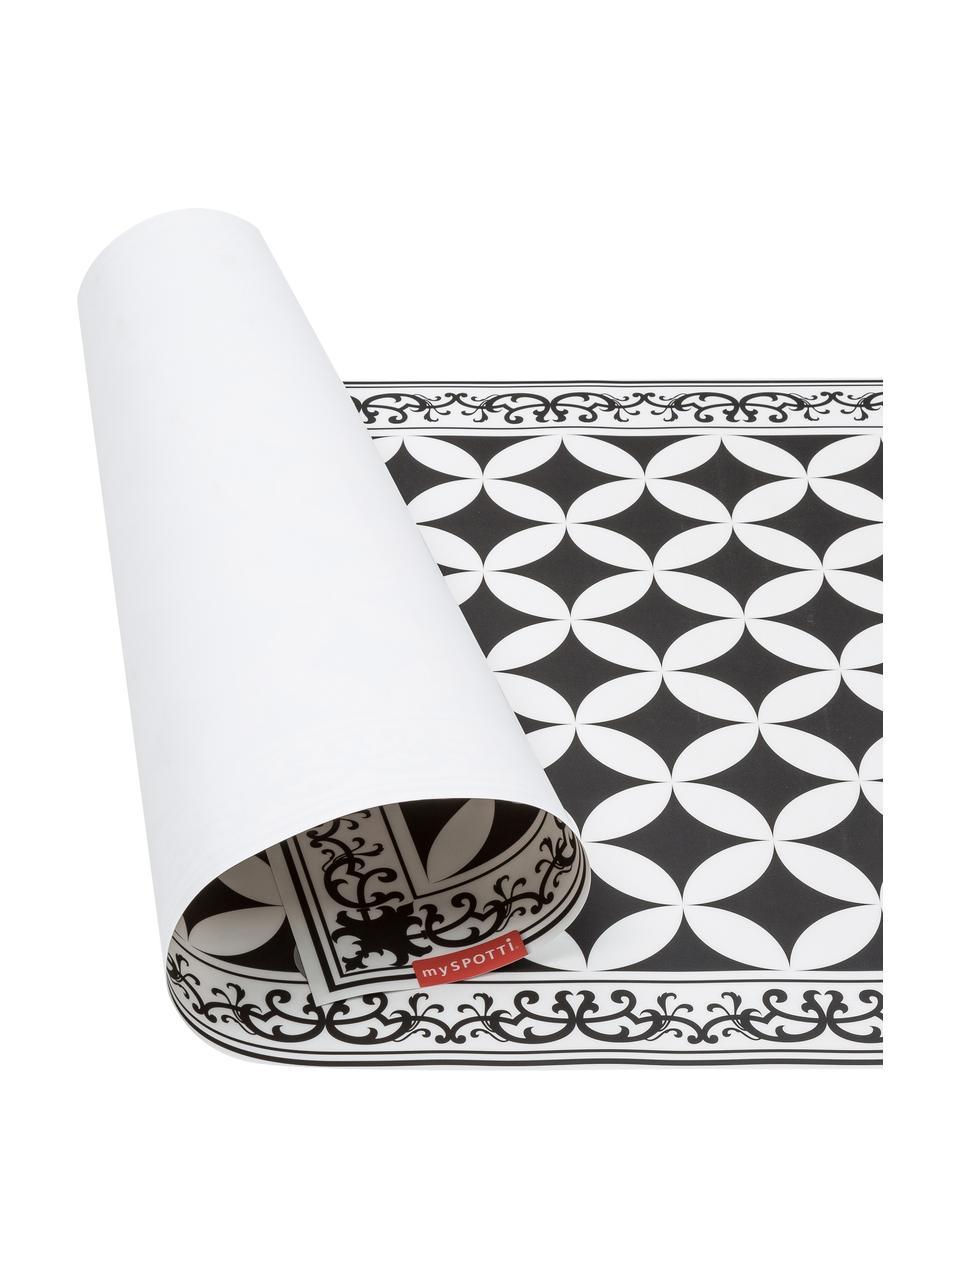 Vlakke vinyl vloermat Chadi in zwart en wit, antislip, Recyclebaar vinyl, Zwart, wit, 65 x 255 cm